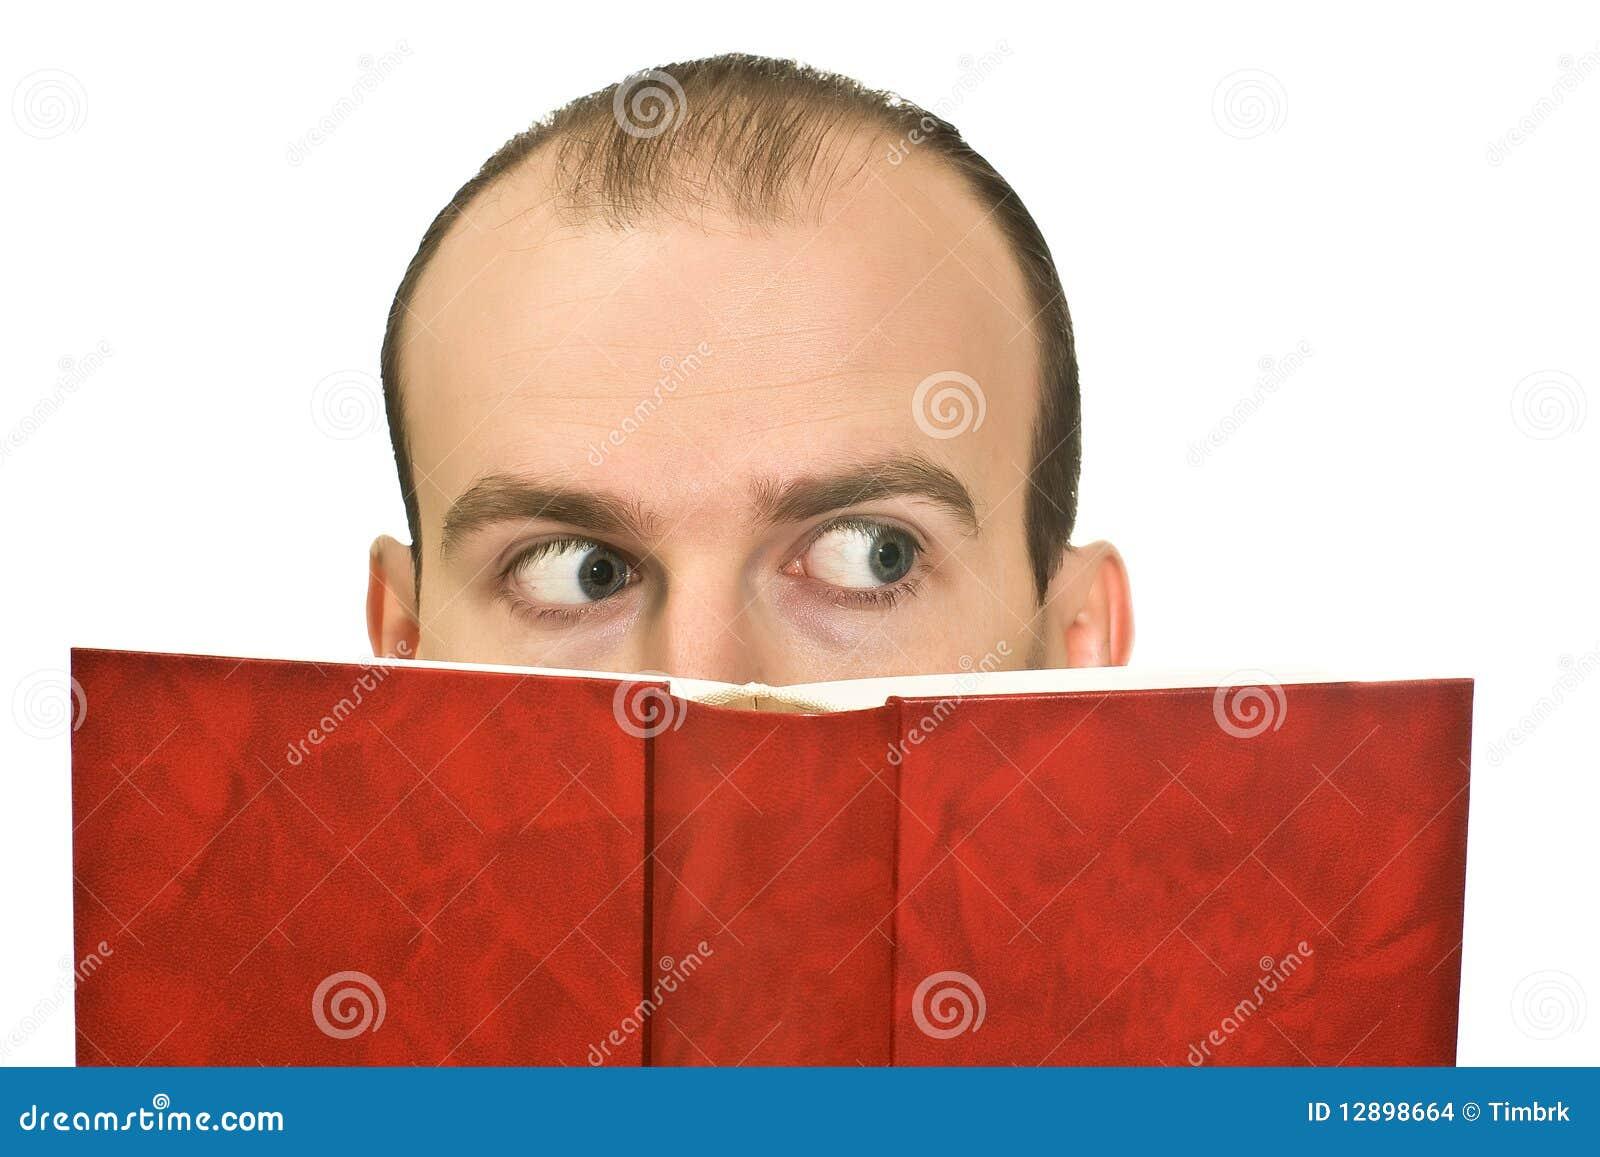 Novel: The Hidden Man by Charles Cumming